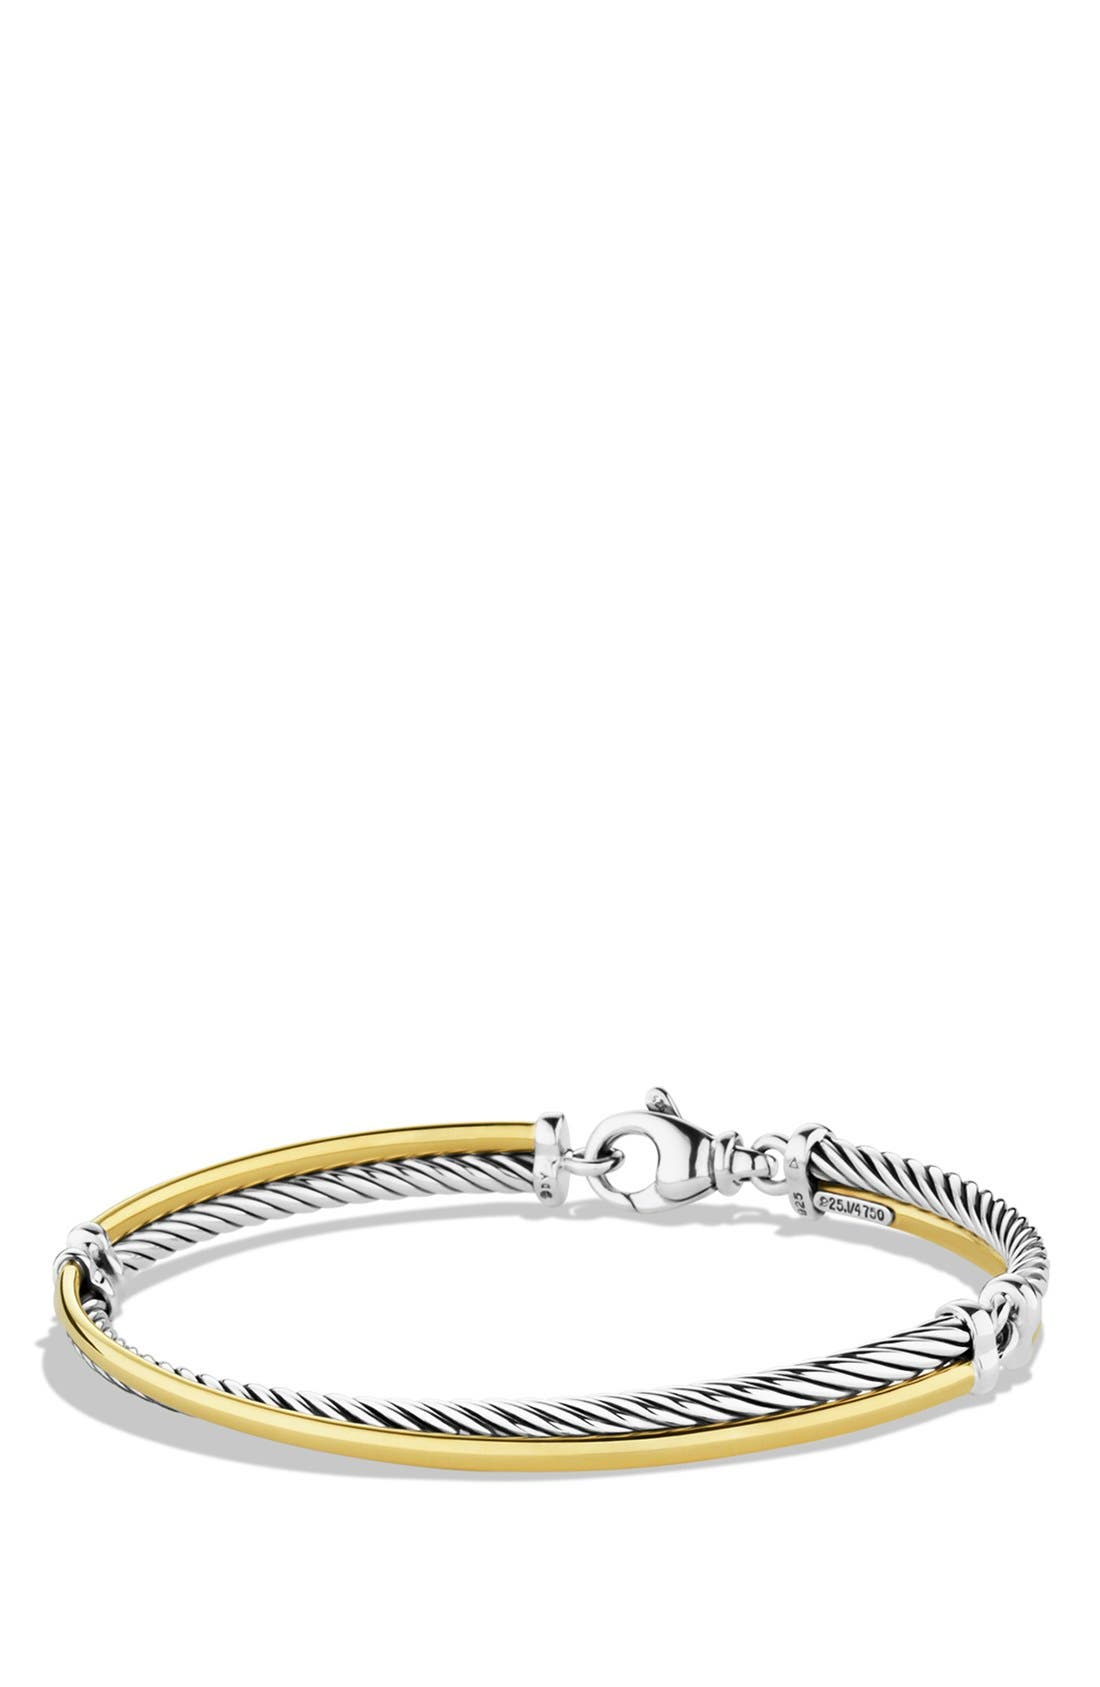 David Yurman 'Crossover' Bracelet with Gold